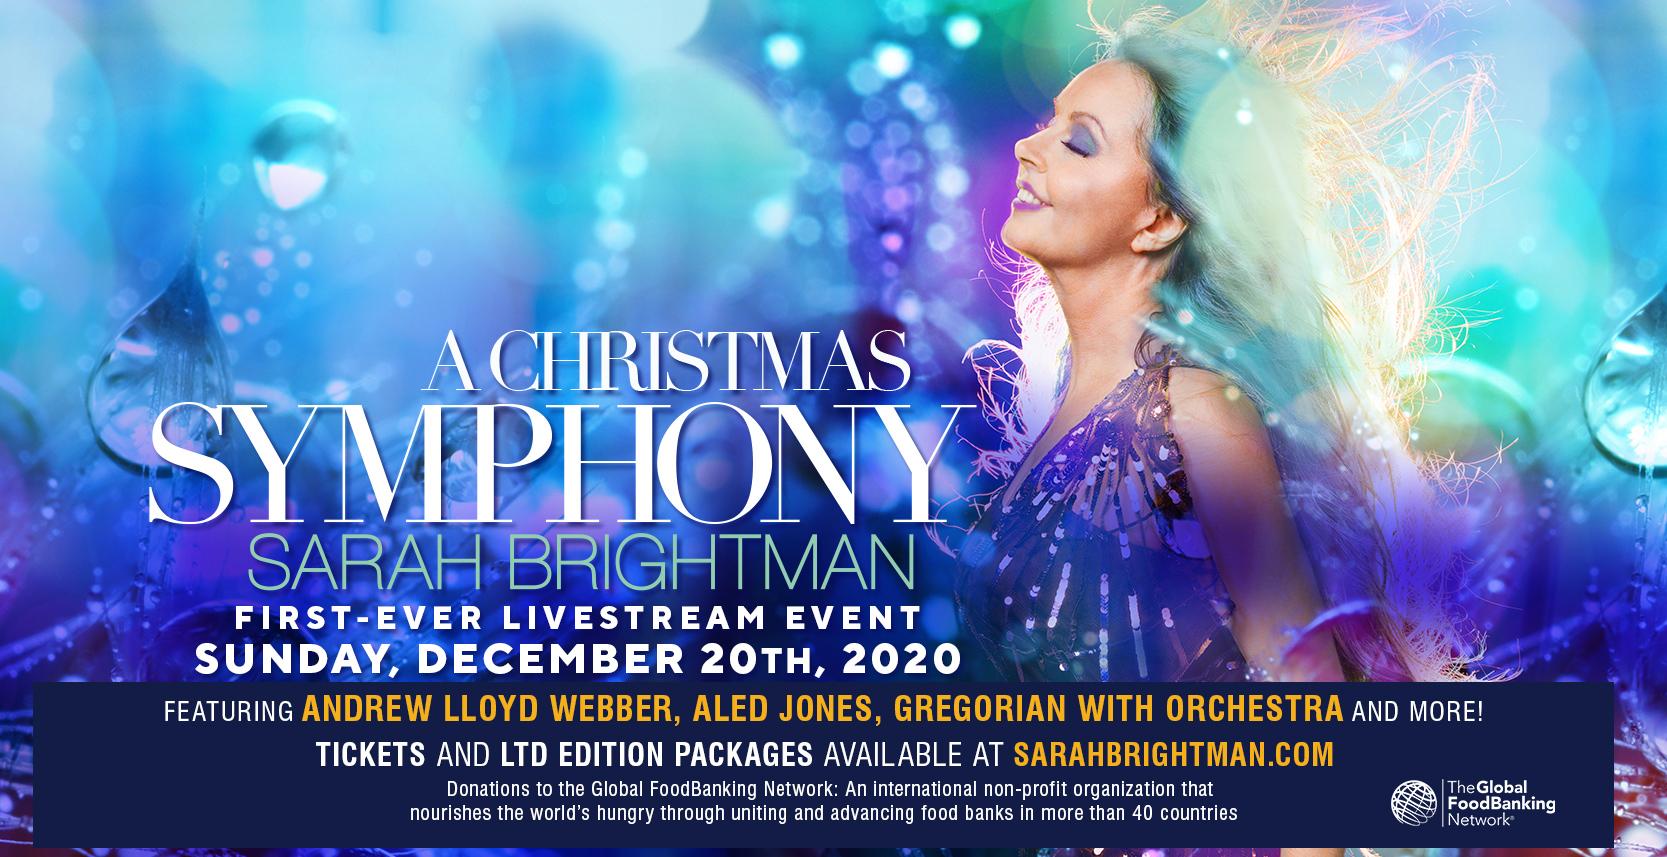 A Christmas Symphony